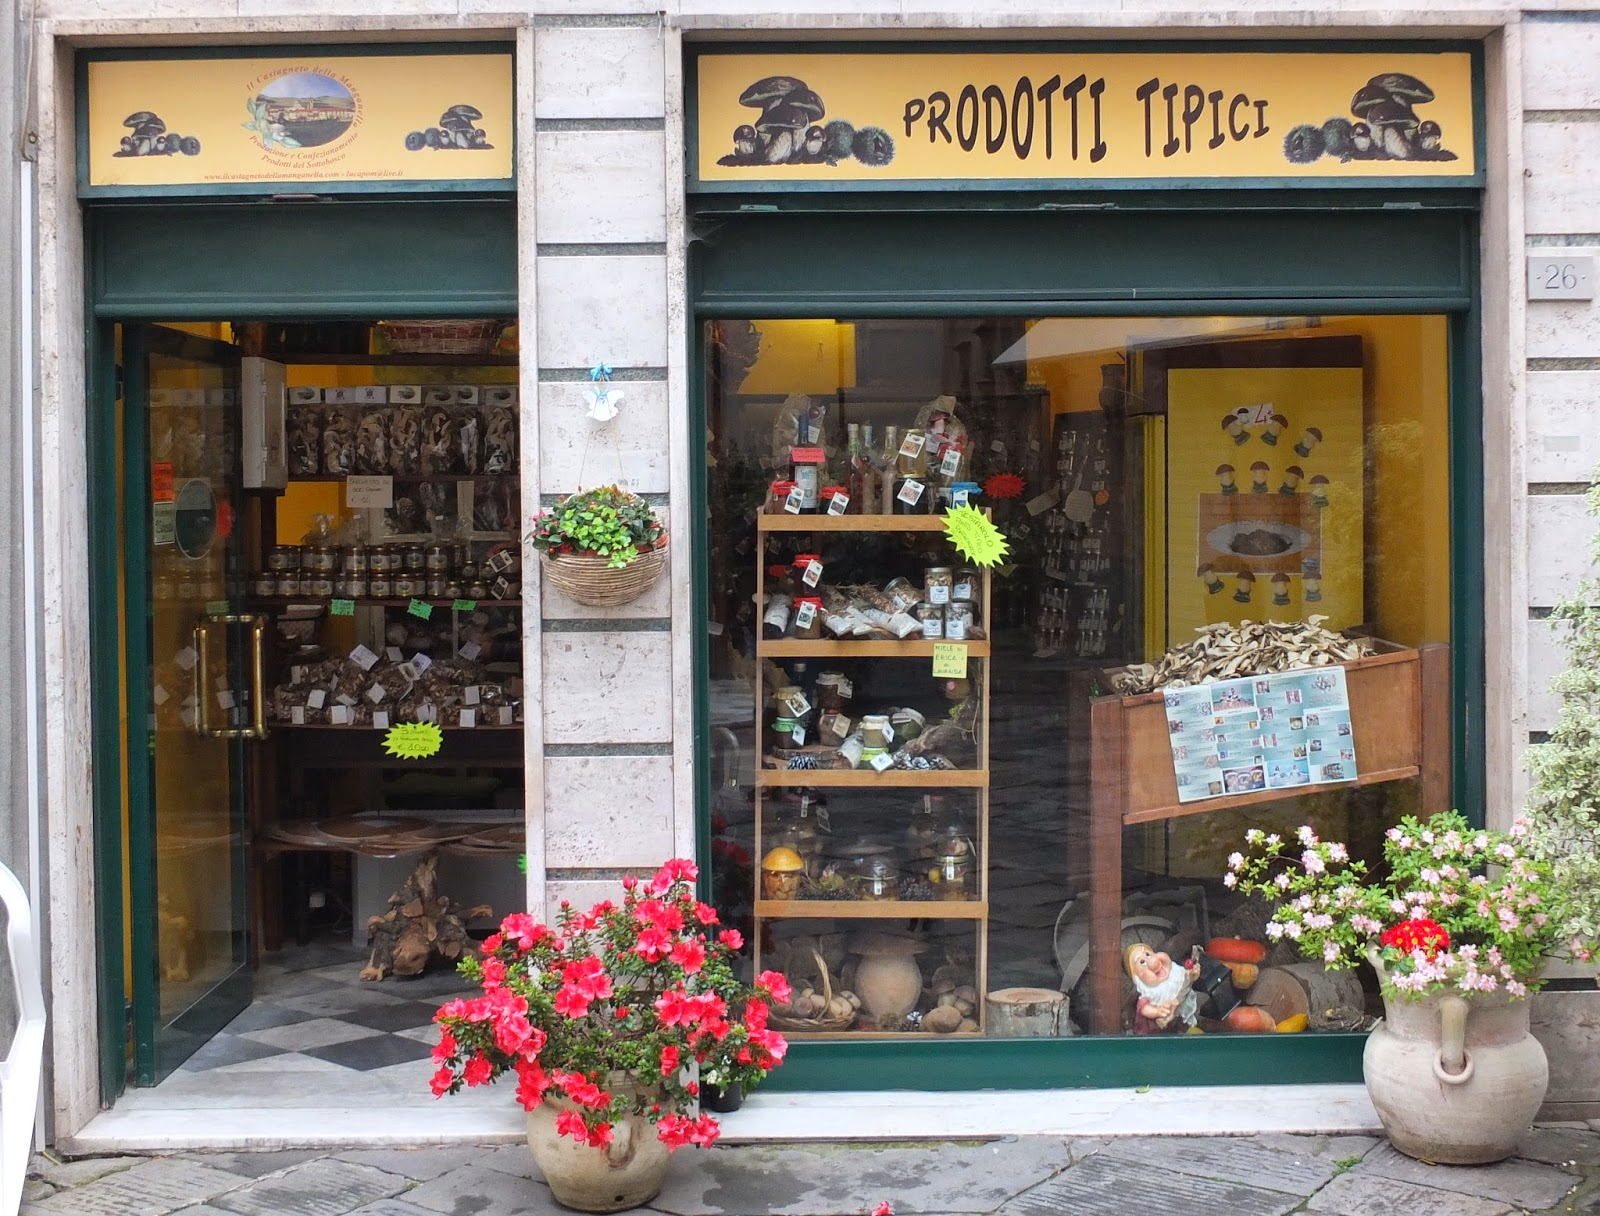 Prodotti Tipici specialties shop